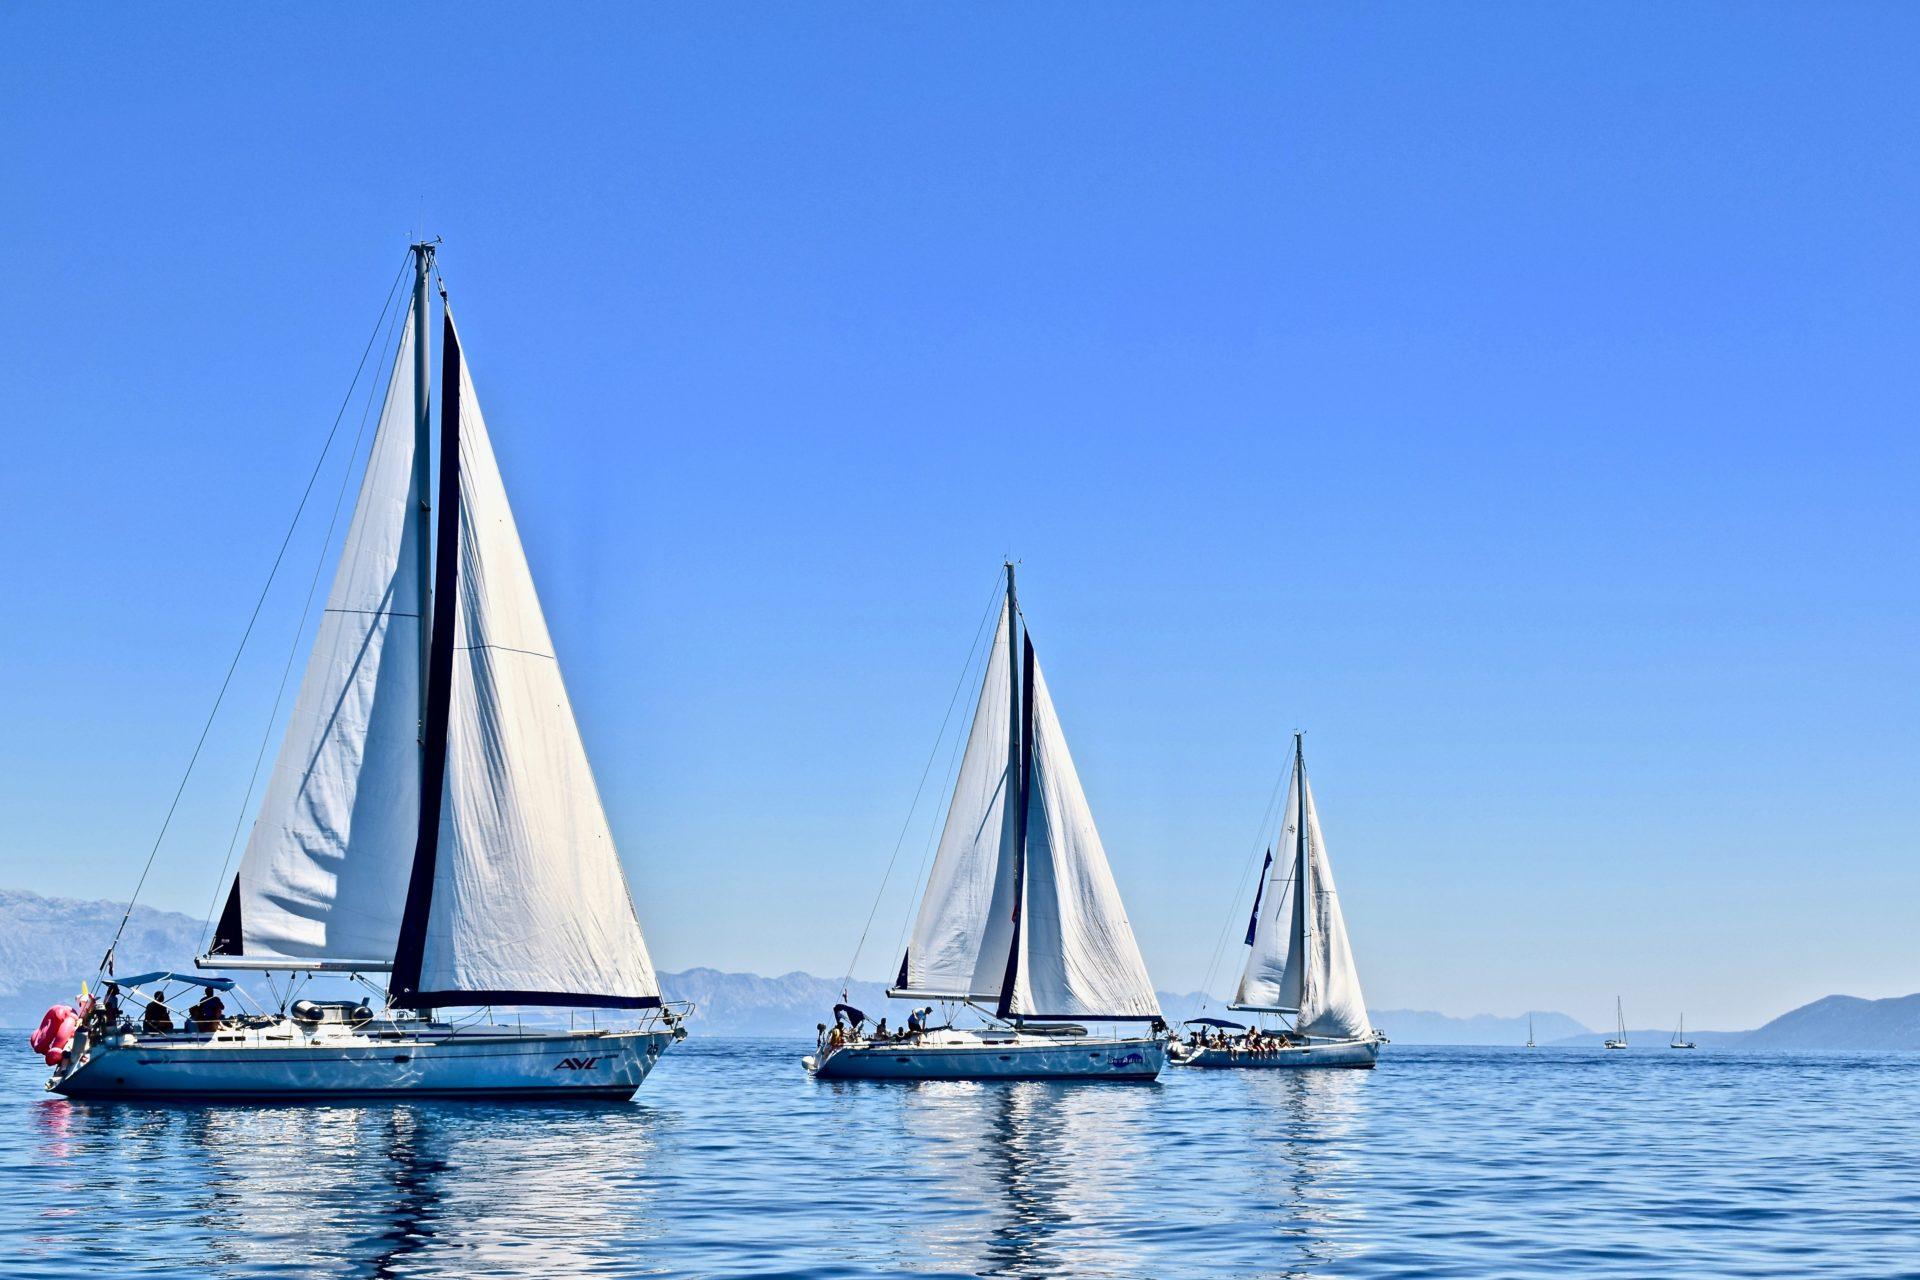 Croatia charter a yacht | Regattas